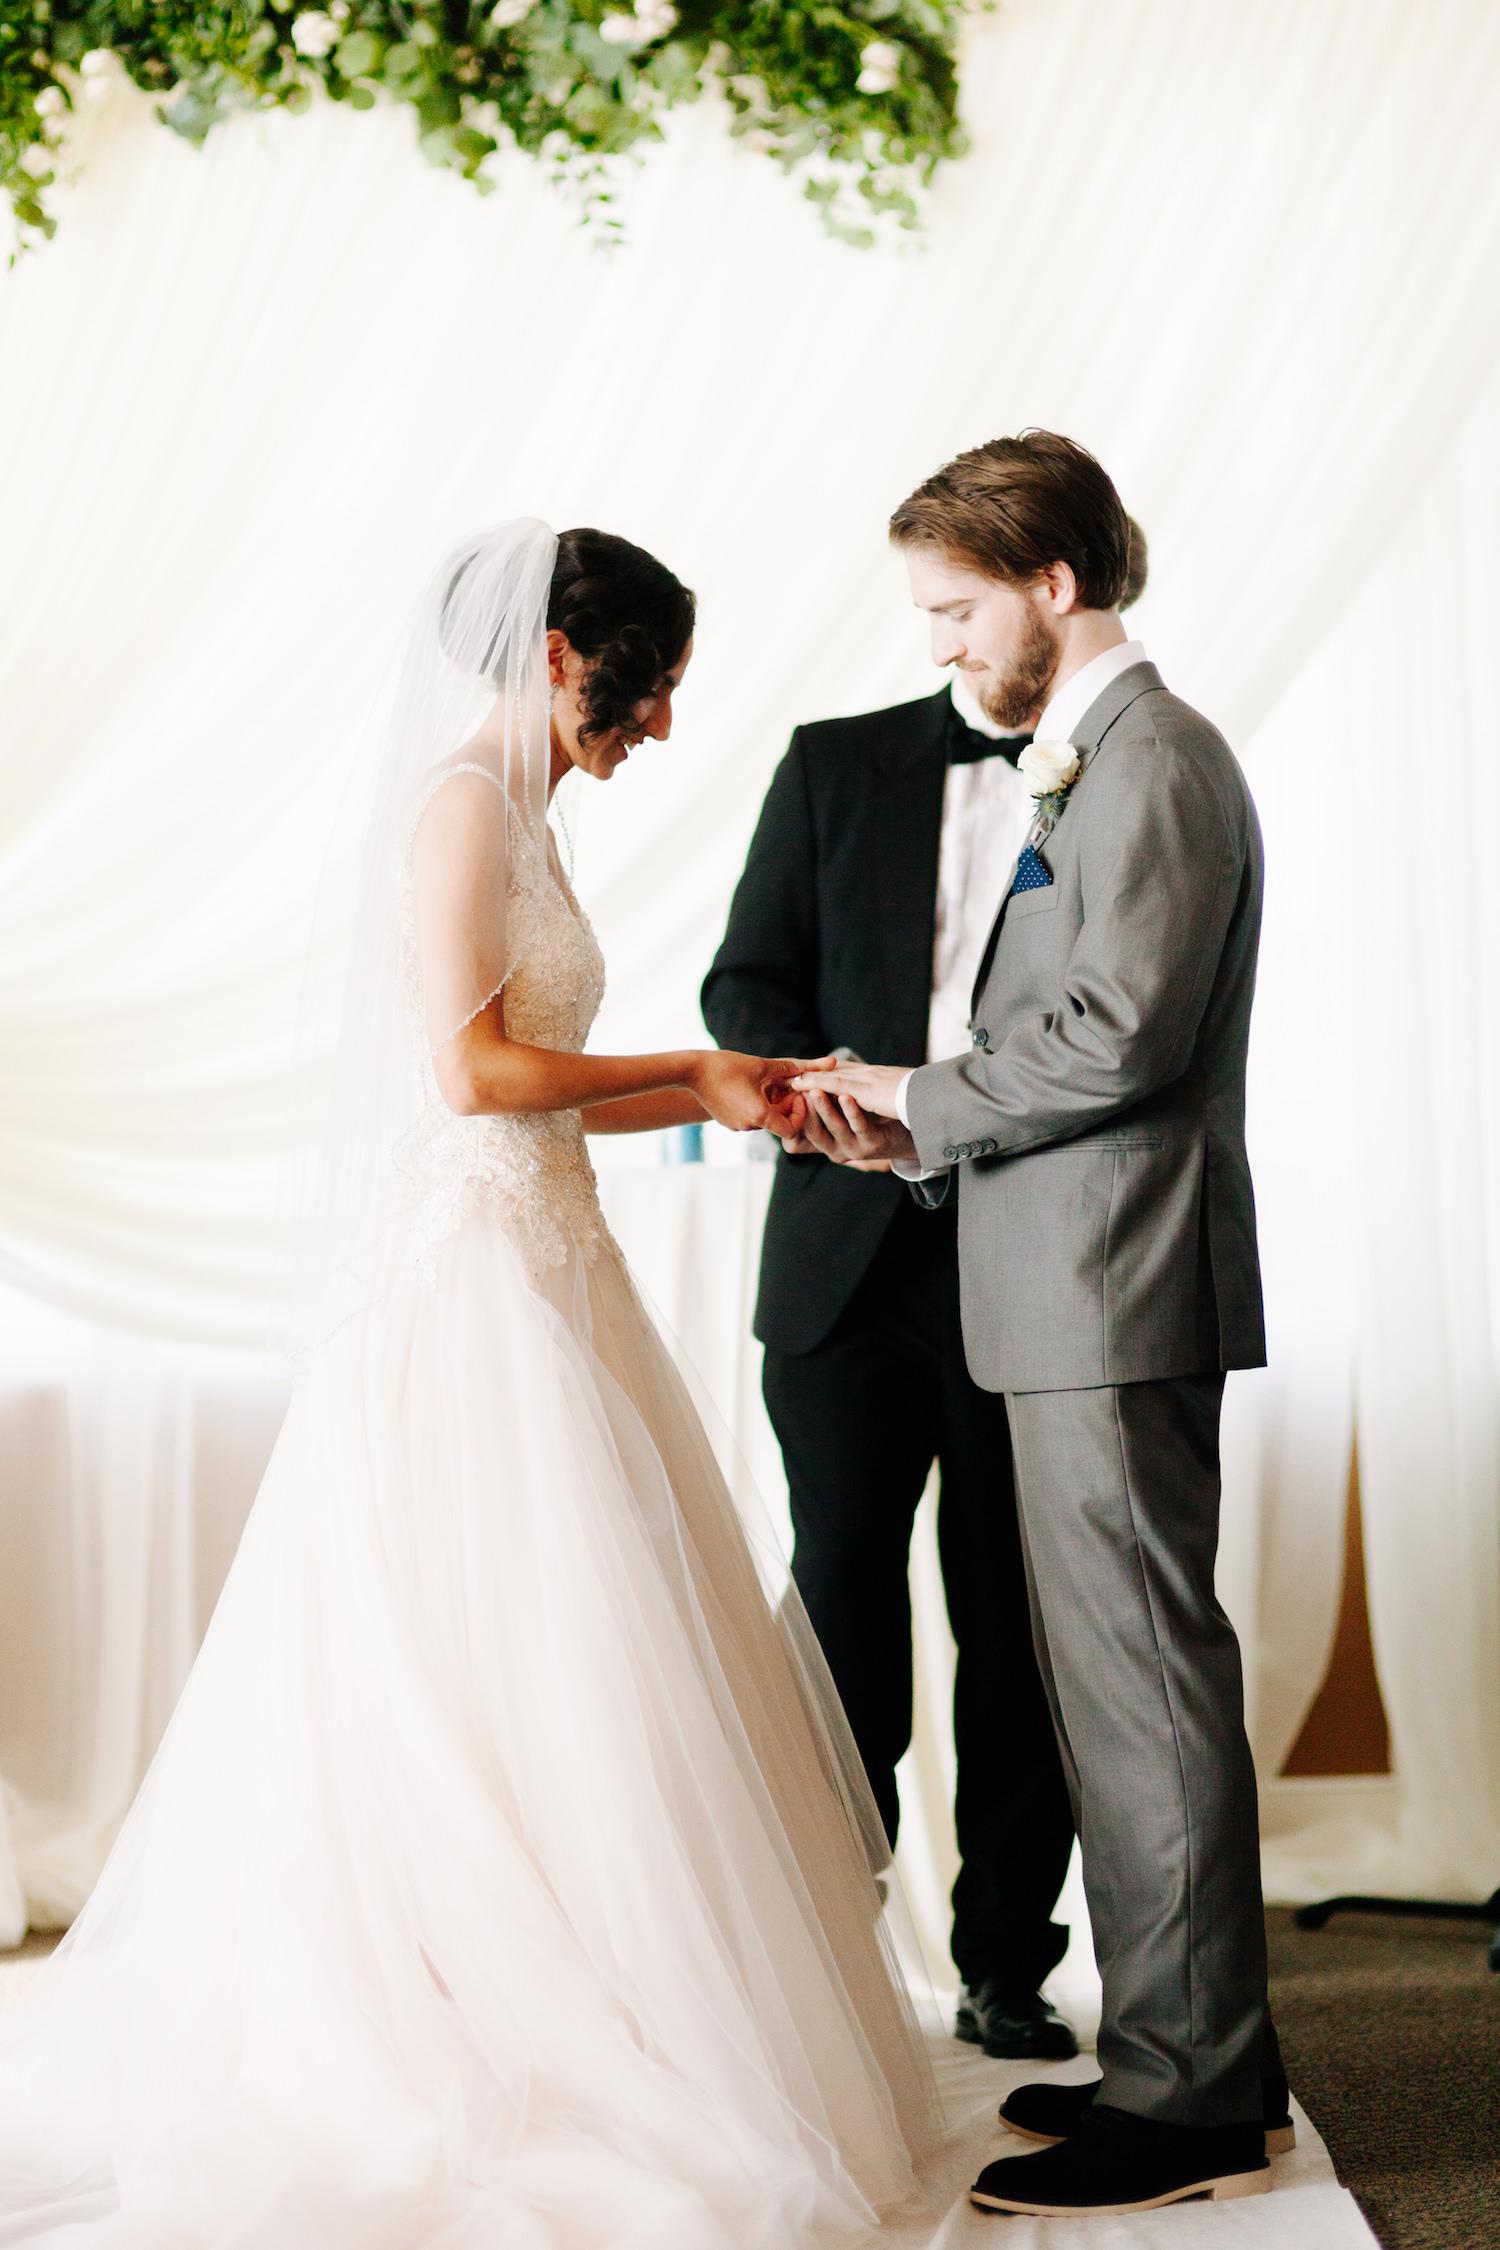 Jared _ Melissa - Ceremony - Jake _ Katie Photography_182.jpg